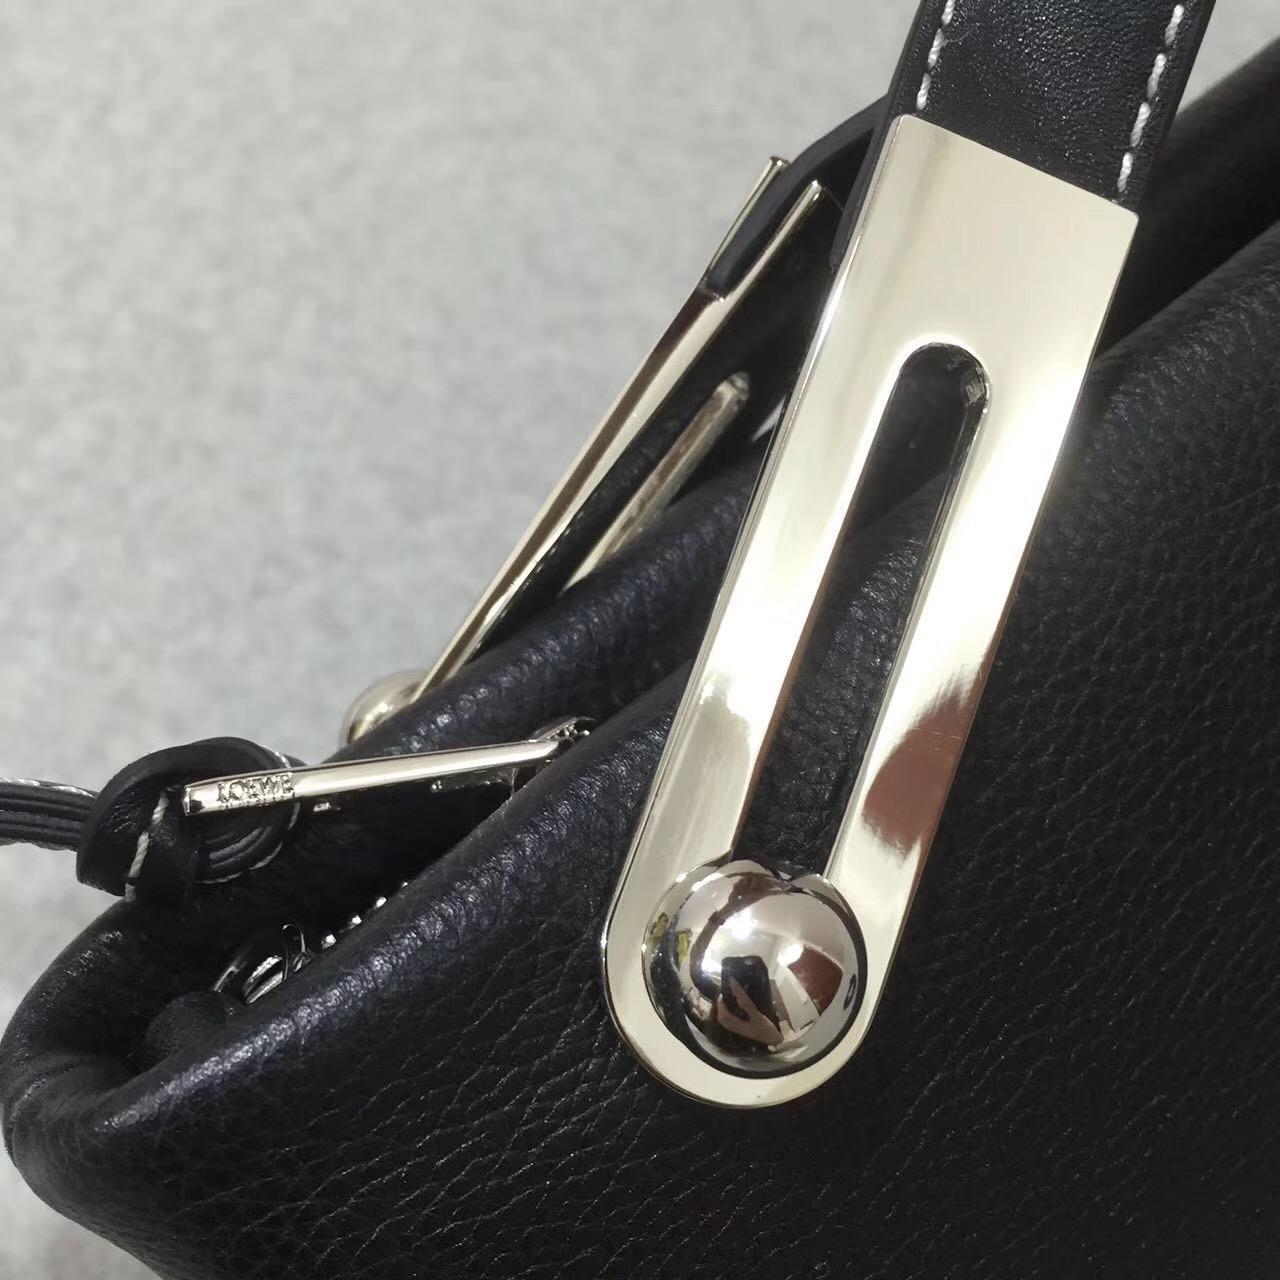 loewe羅意威 Missy Small Bag 軟顆粒小牛皮黑色 黃金麂皮襯裏T形